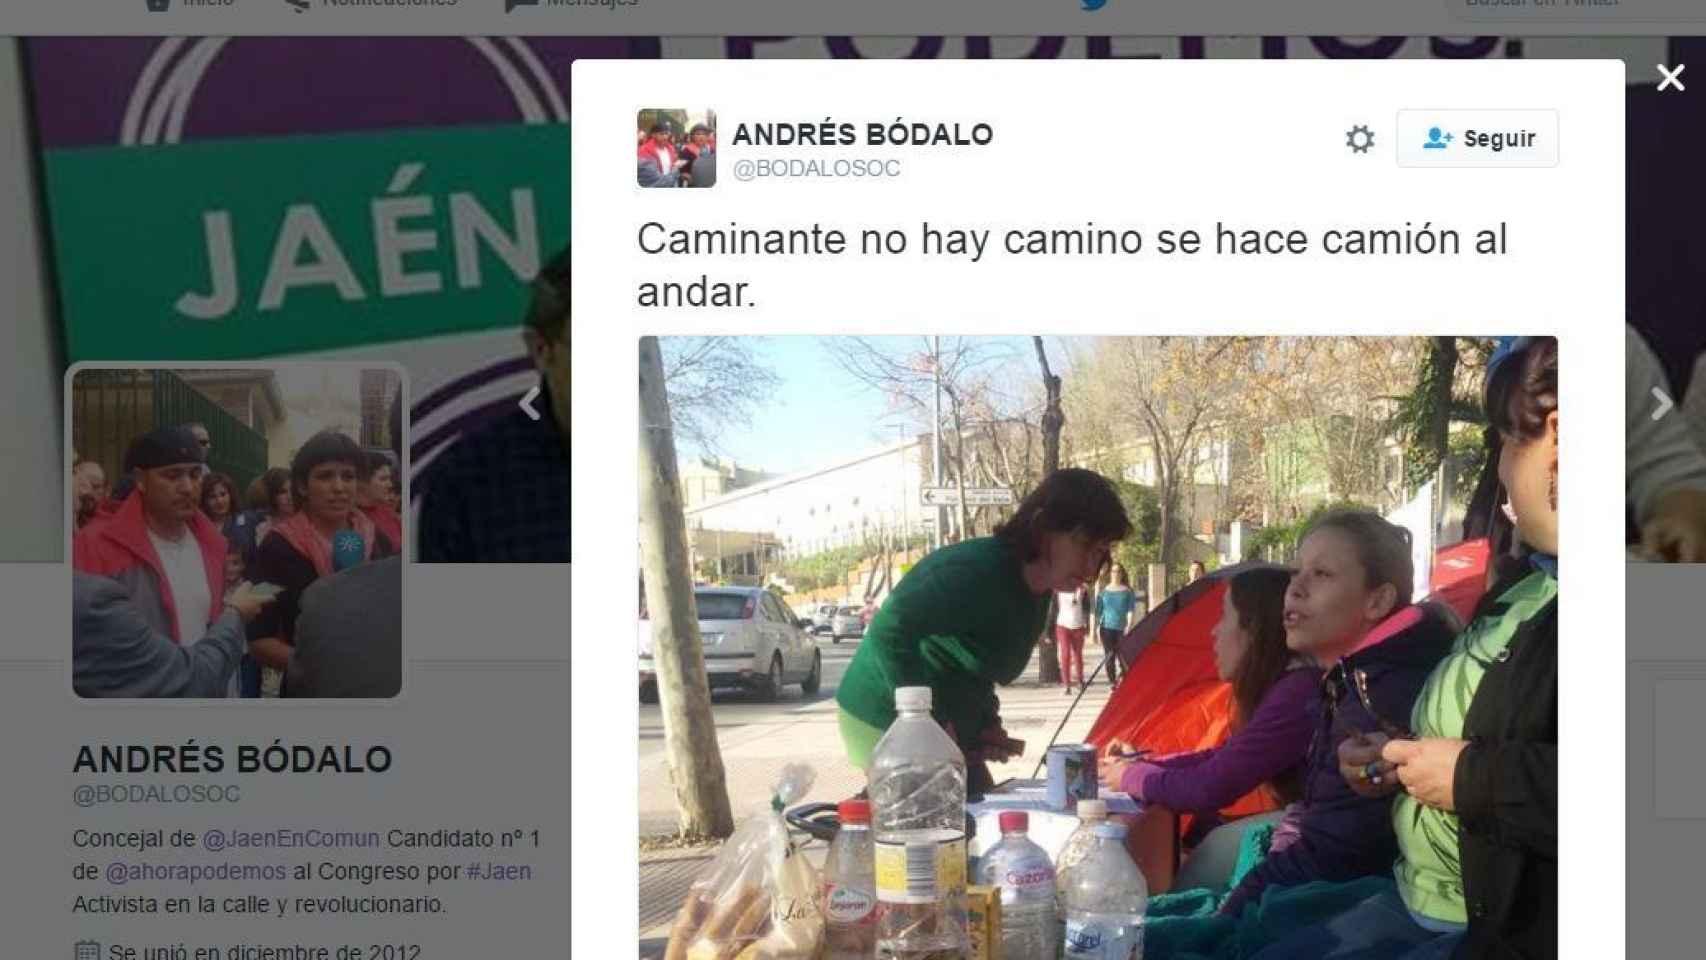 Captura de la cuenta de Twitter de Andres Bódalo.